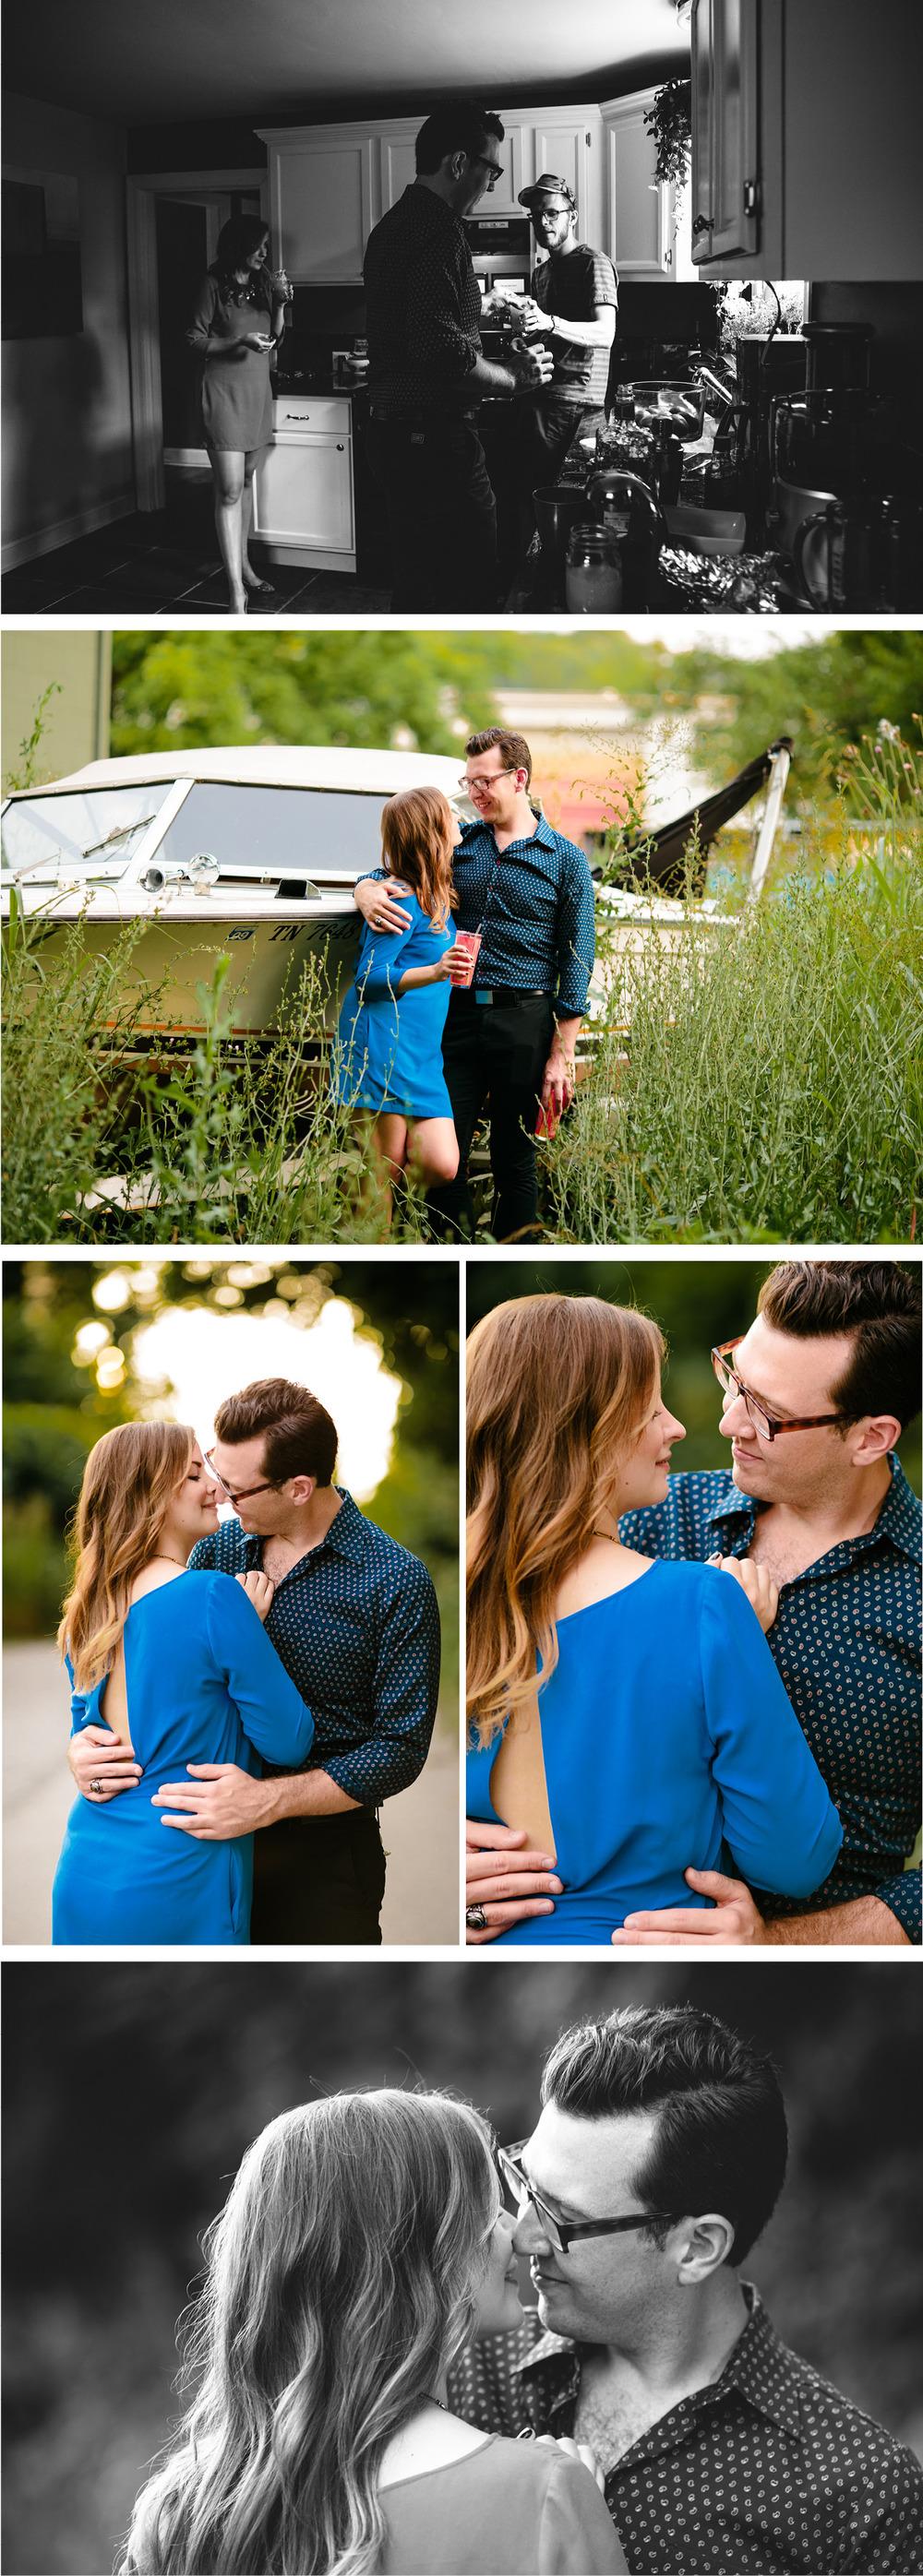 CK-Photo-Nashville-Wedding-Photographer-DL4.jpg